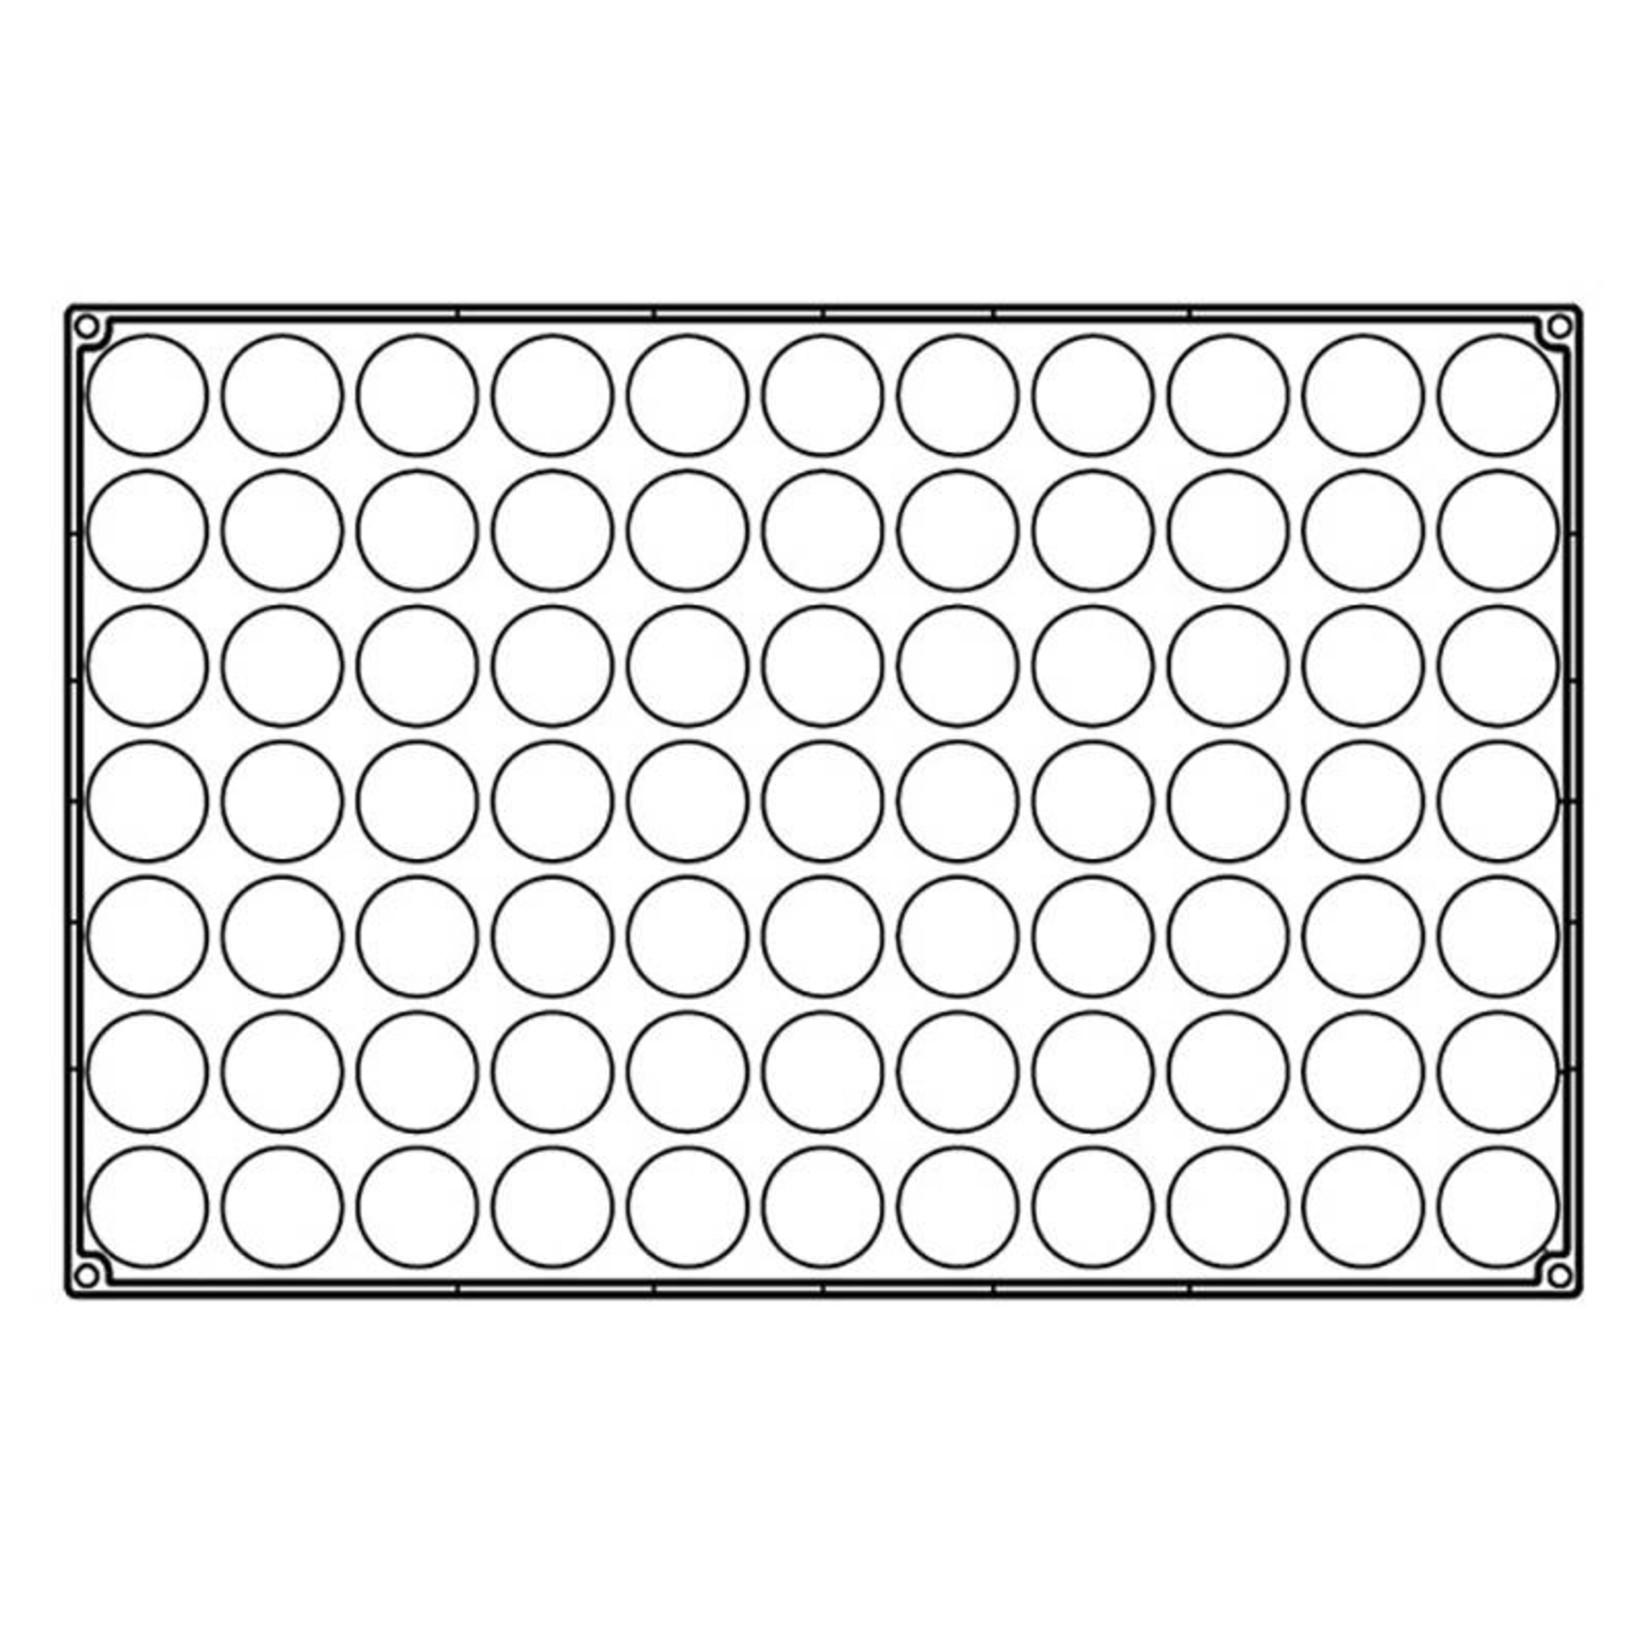 Pavoni Pavoni - Pavoflex silicone mold, Semisfera, Mignon (77 cavity), PX303